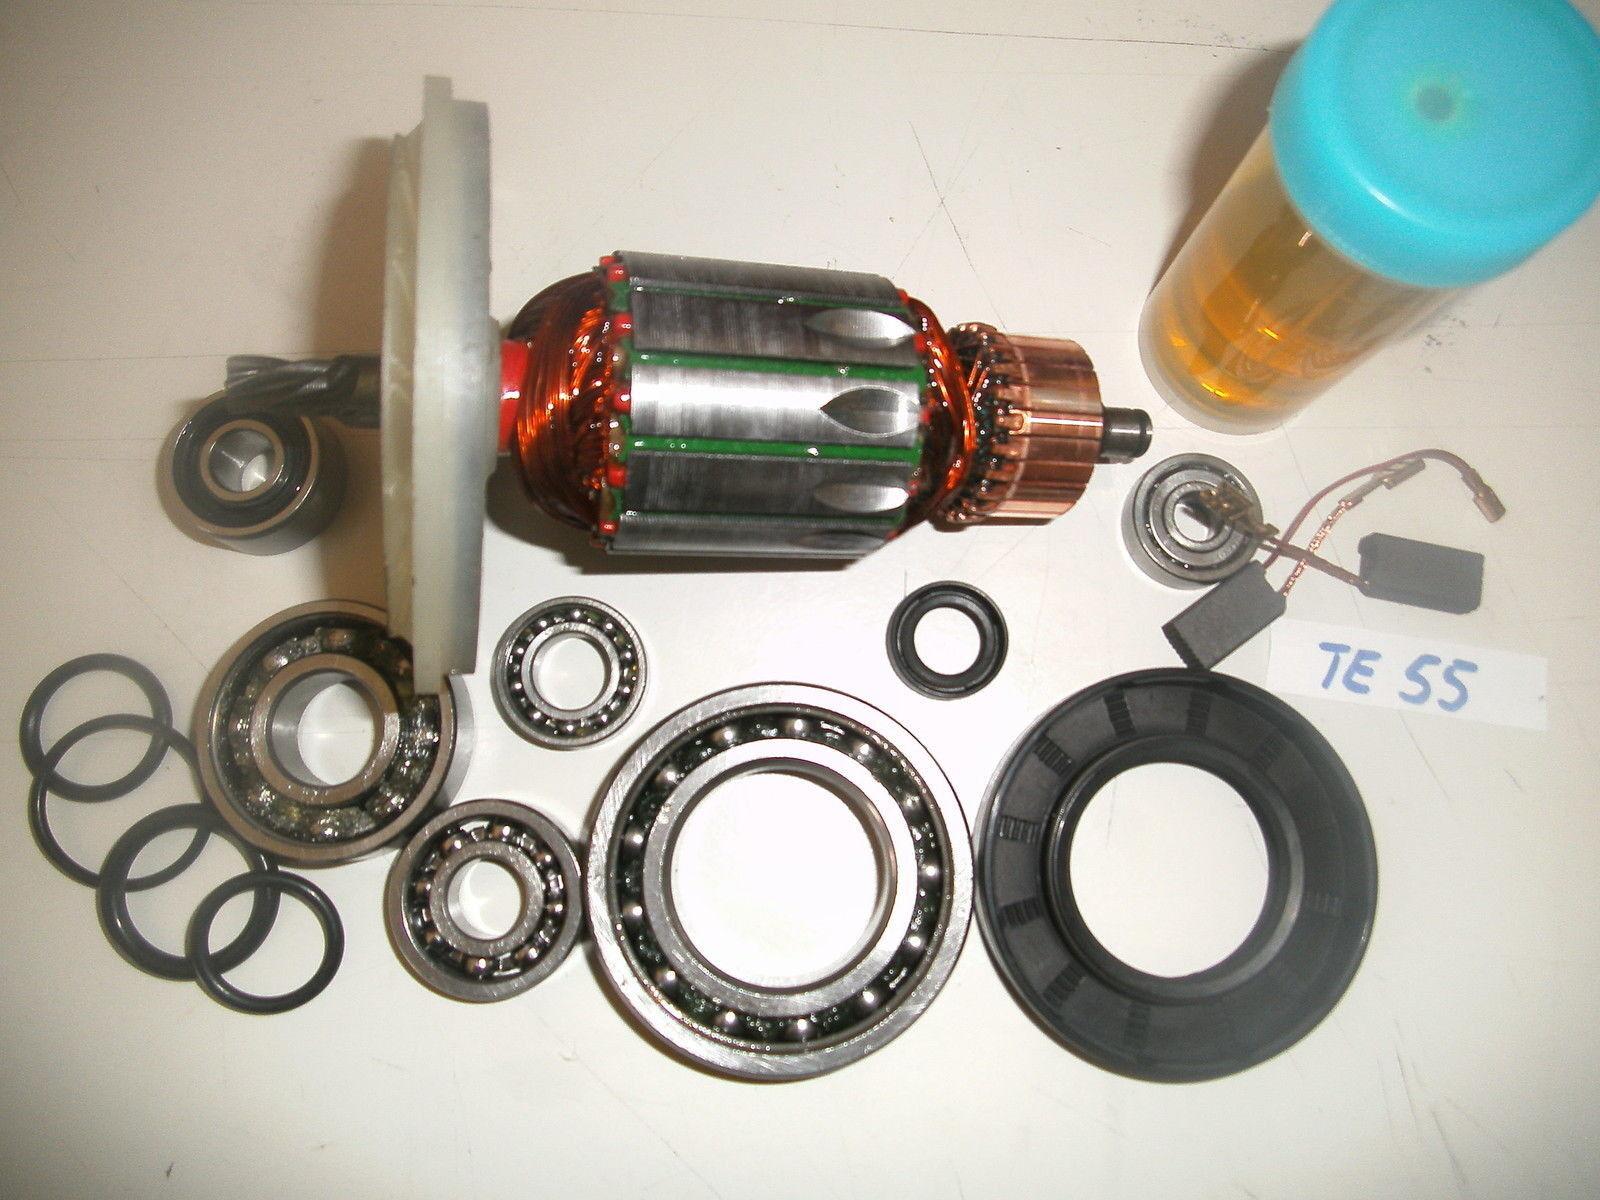 Hilti TE 55 Anker, Rotor und Reparatursatz Reparatursatz Reparatursatz komplett 24d768